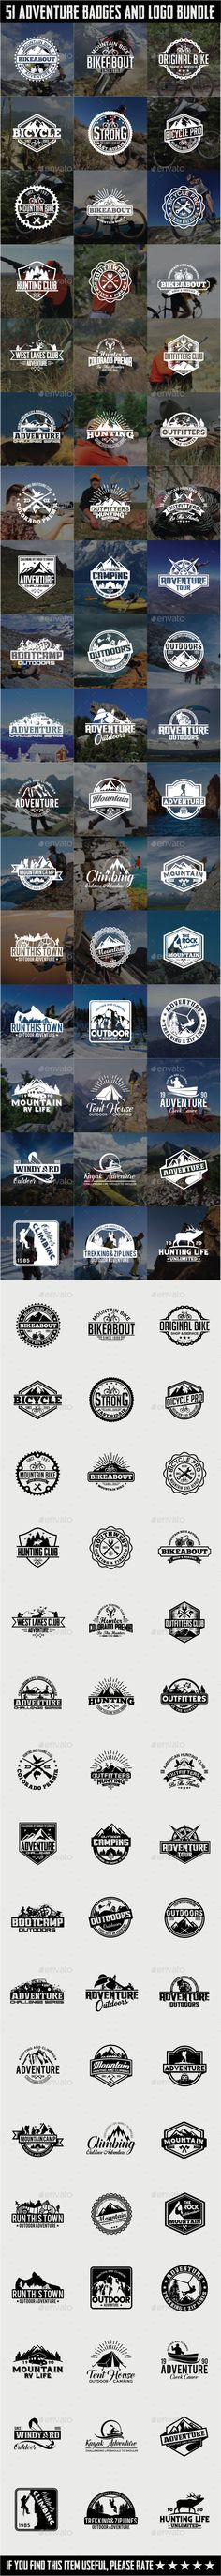 51 Adventure Badges and Logos Bundle Template #design Download: http://graphicriver.net/item/51-adventure-badges-and-logos-bundle/12395442?ref=ksioks